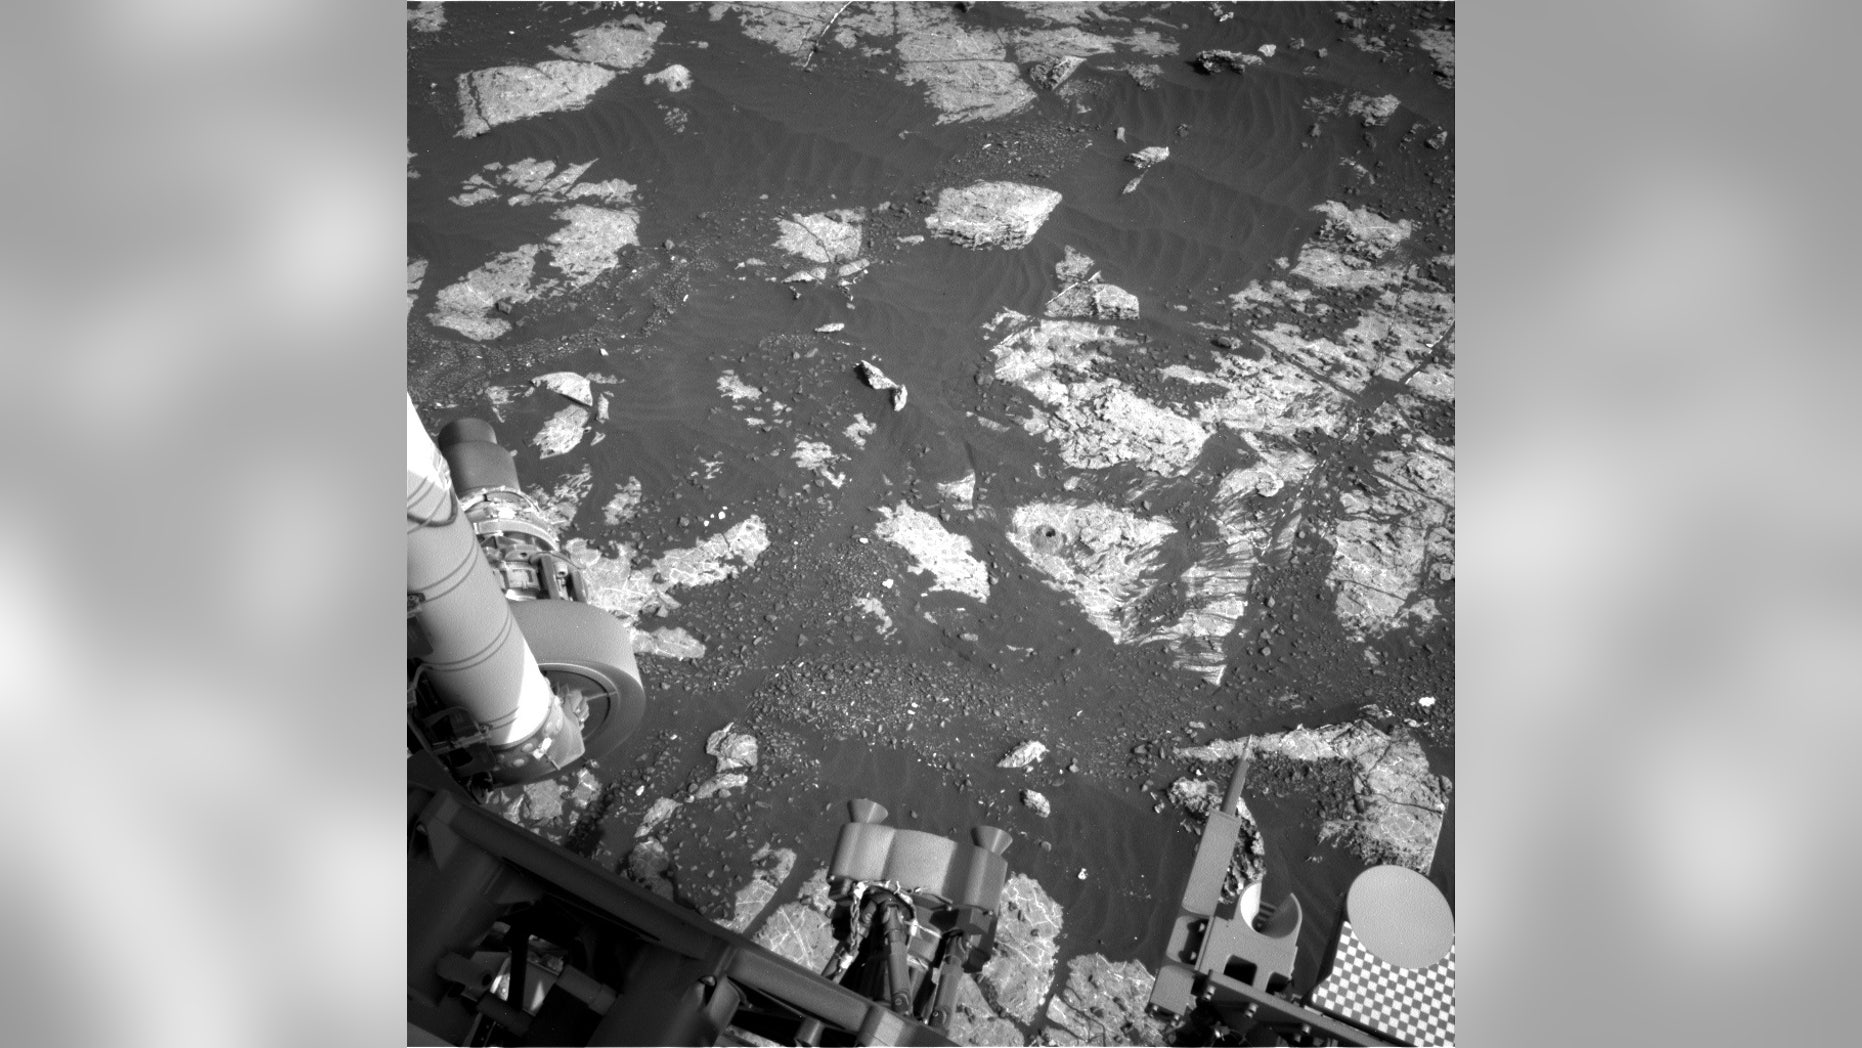 mars rover drill status - photo #35